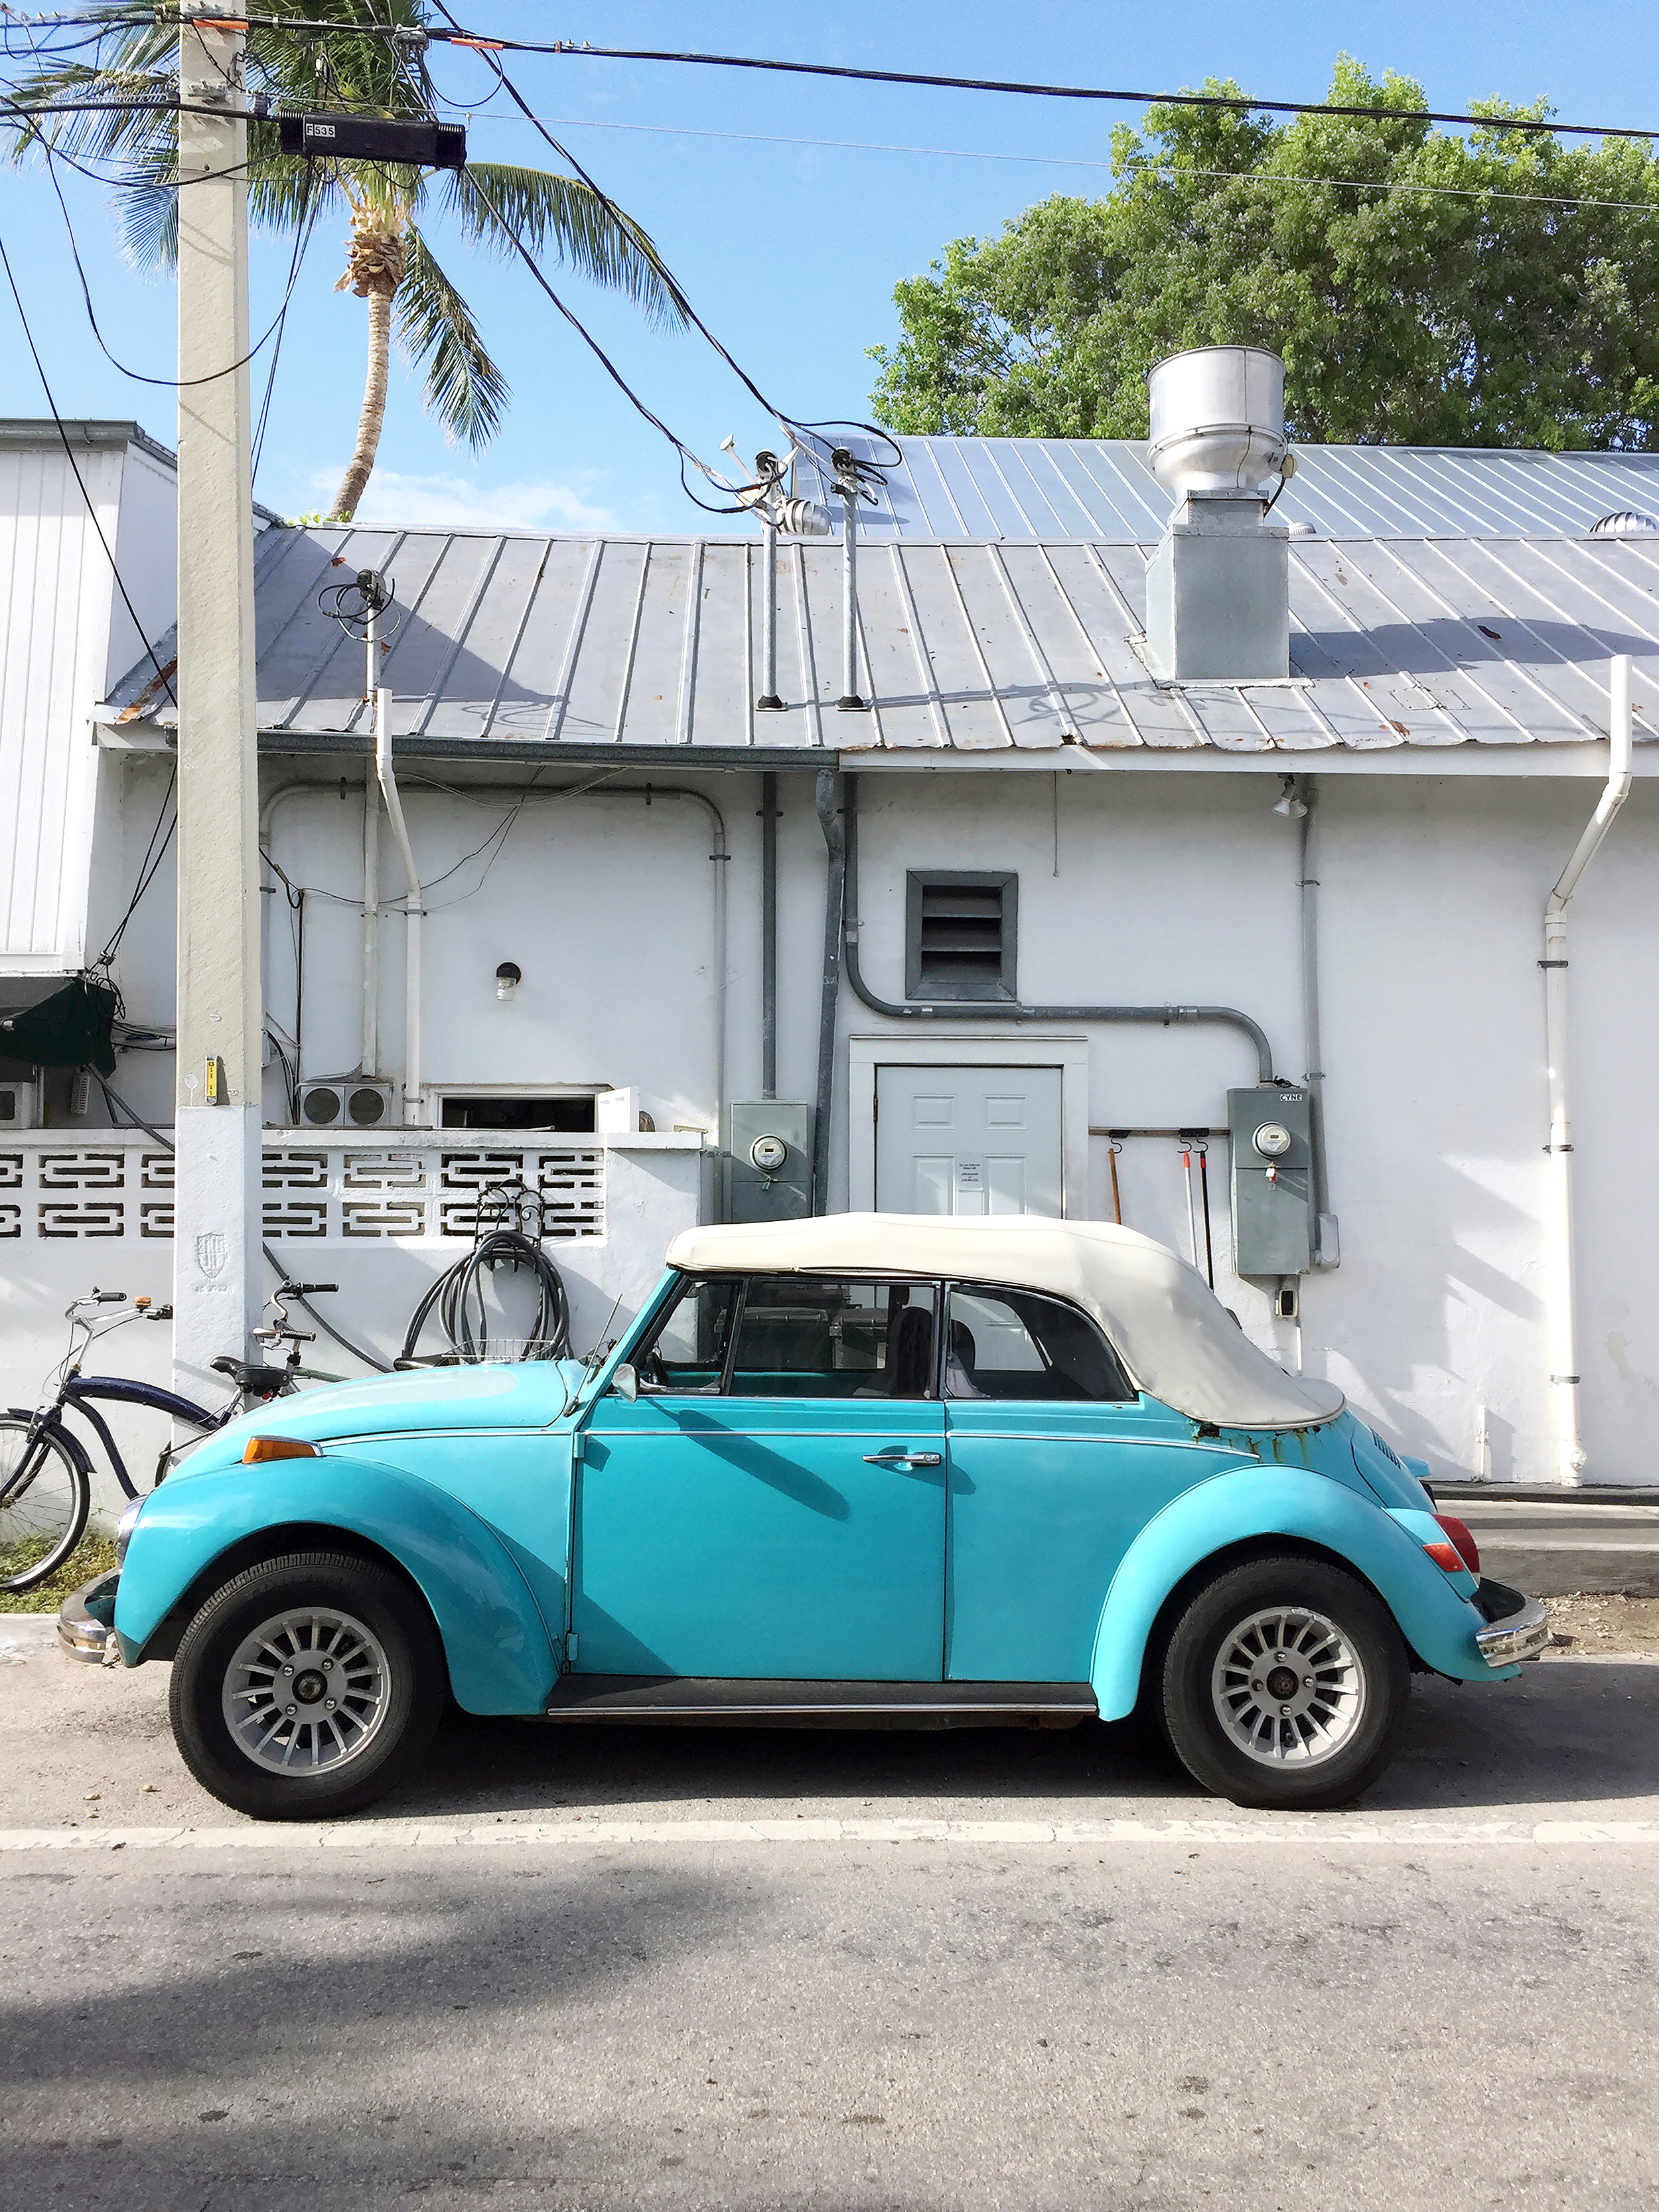 amy_chen_design_vintage_old_car_blue_key_west_fl_florida_travel_wanderlust_vacation